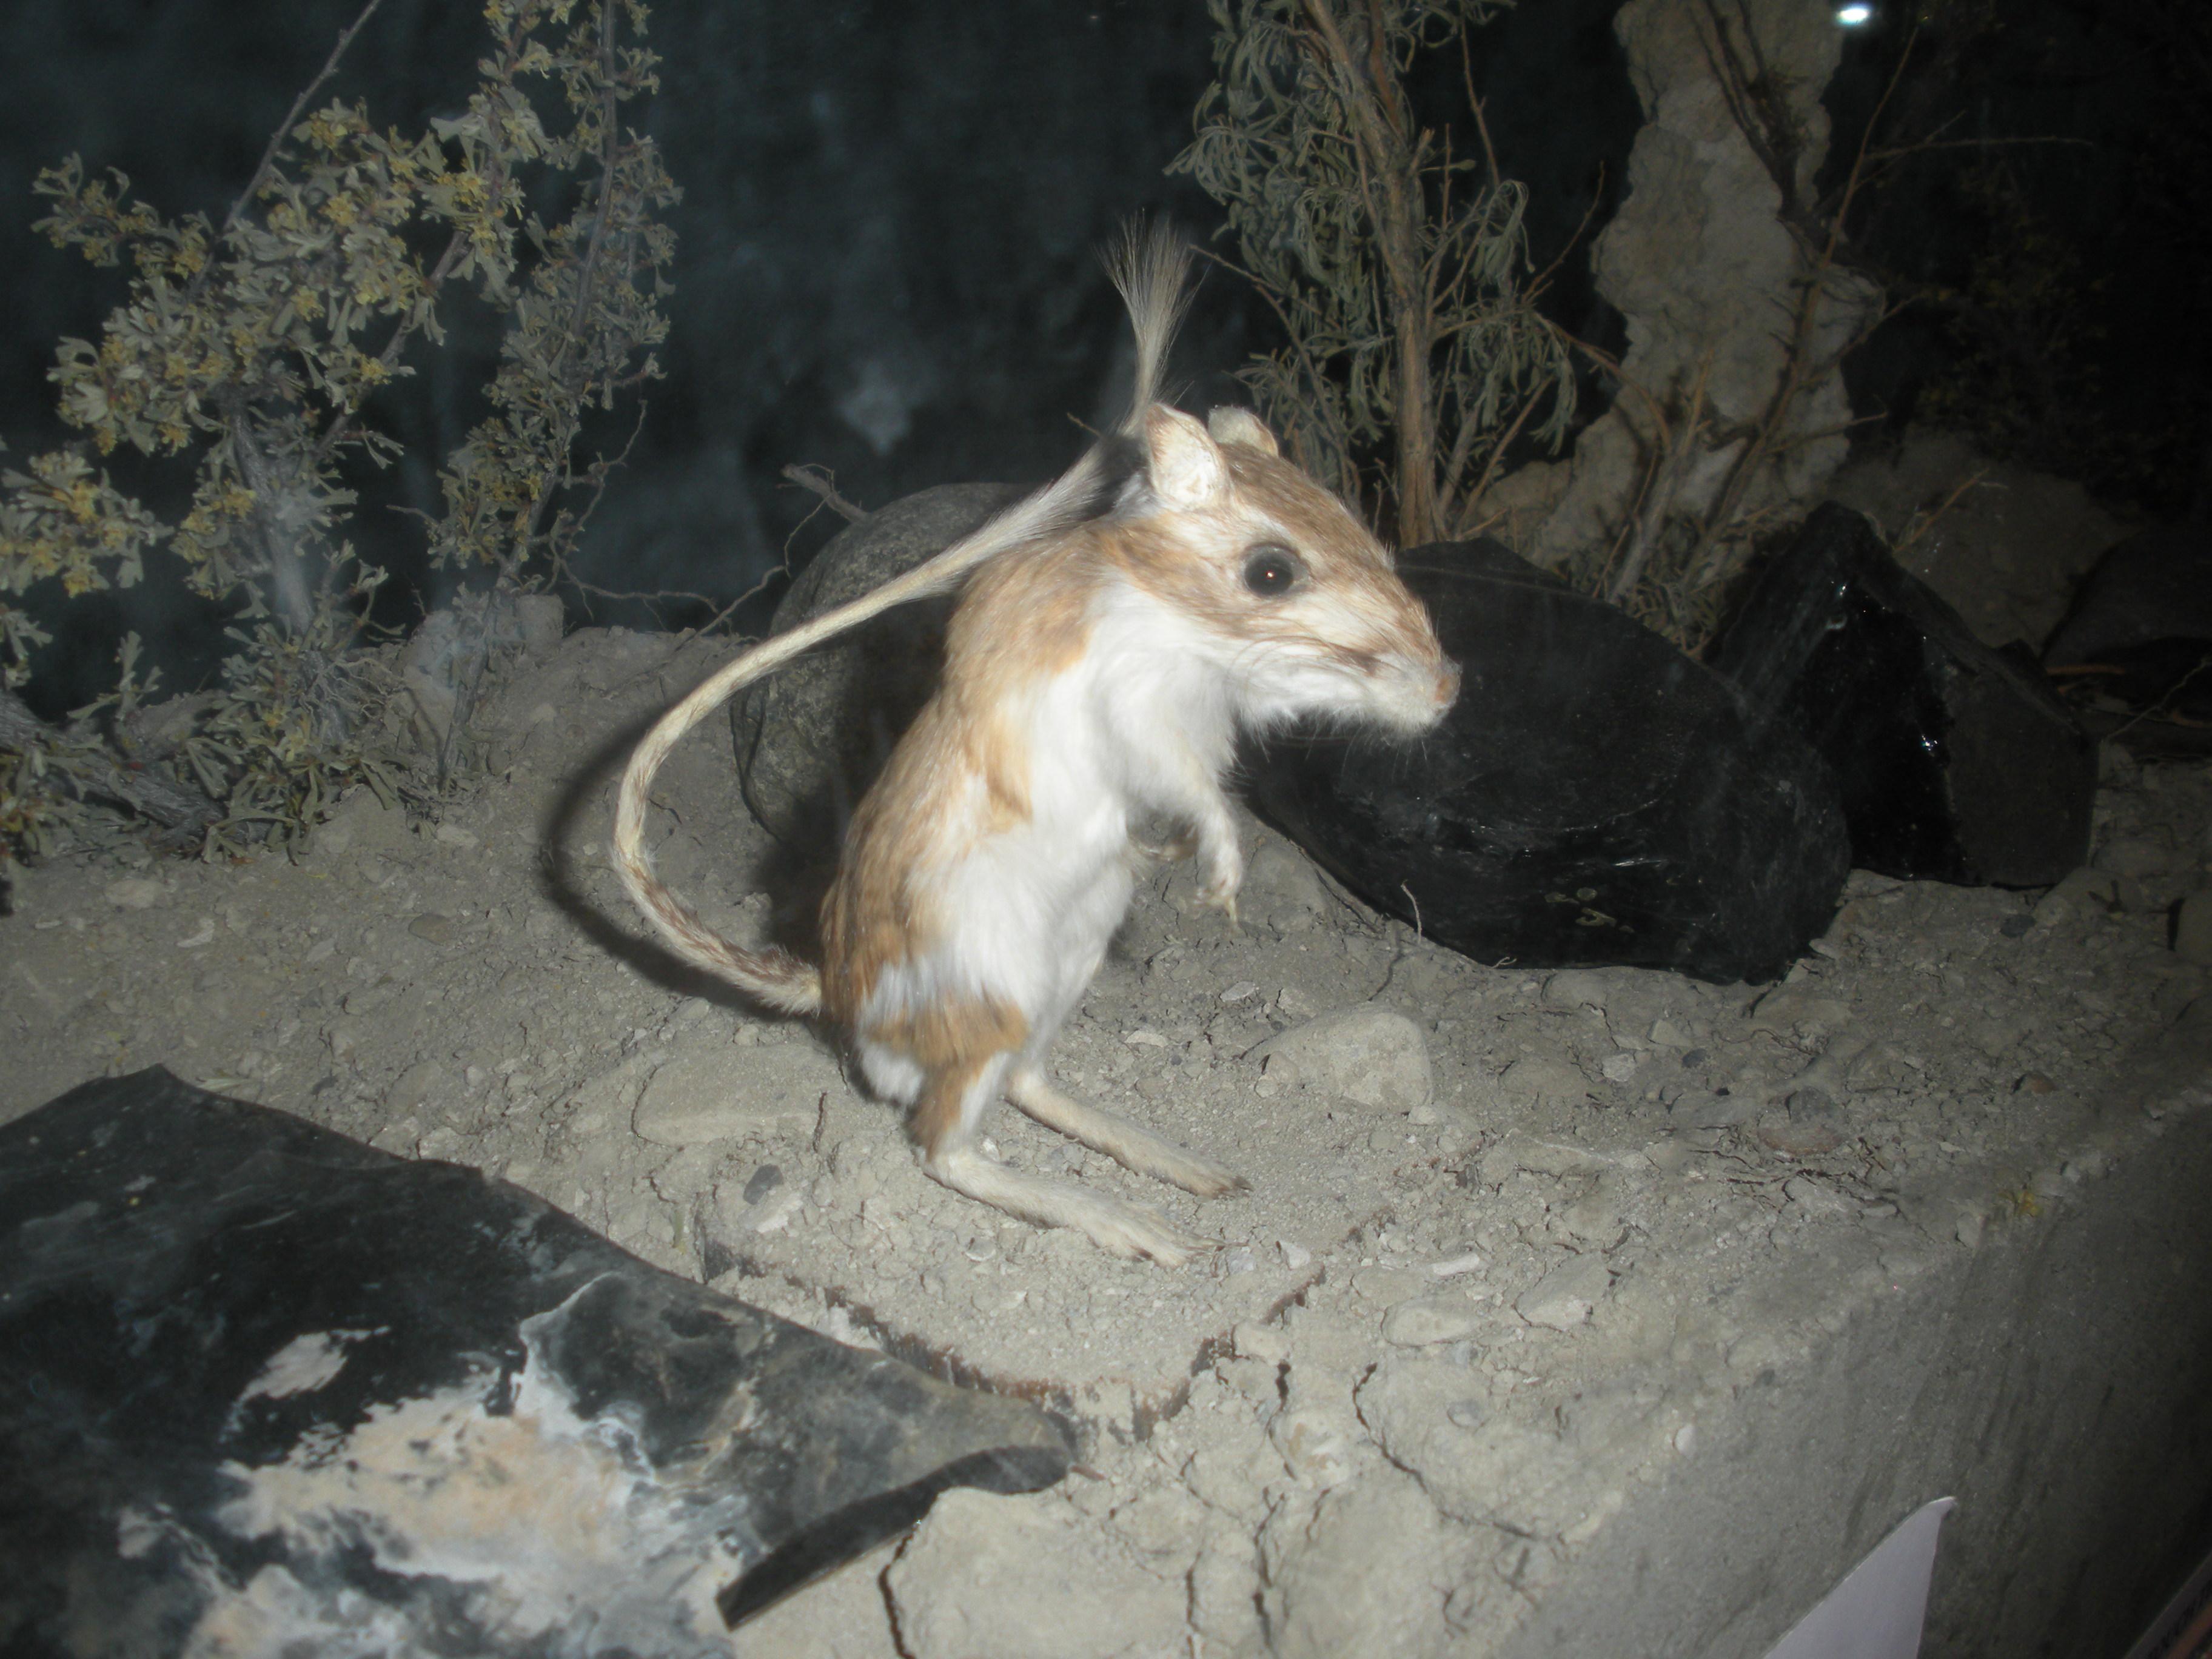 Panamint Kangaroo Rat Wikipedia